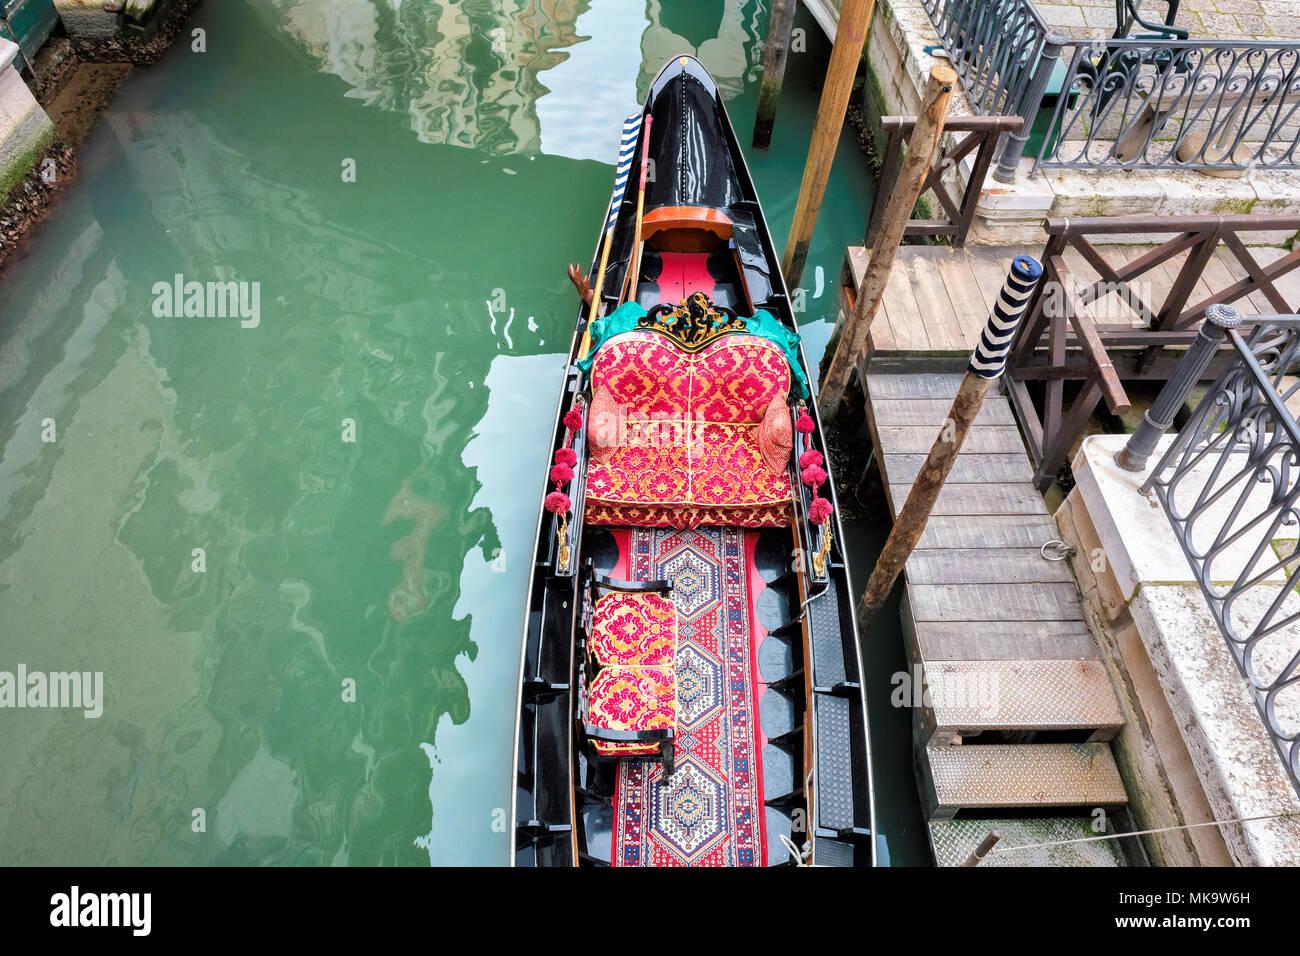 Venice landscape. Venetian canal with gondola in Venice, Italy. - Stock Image